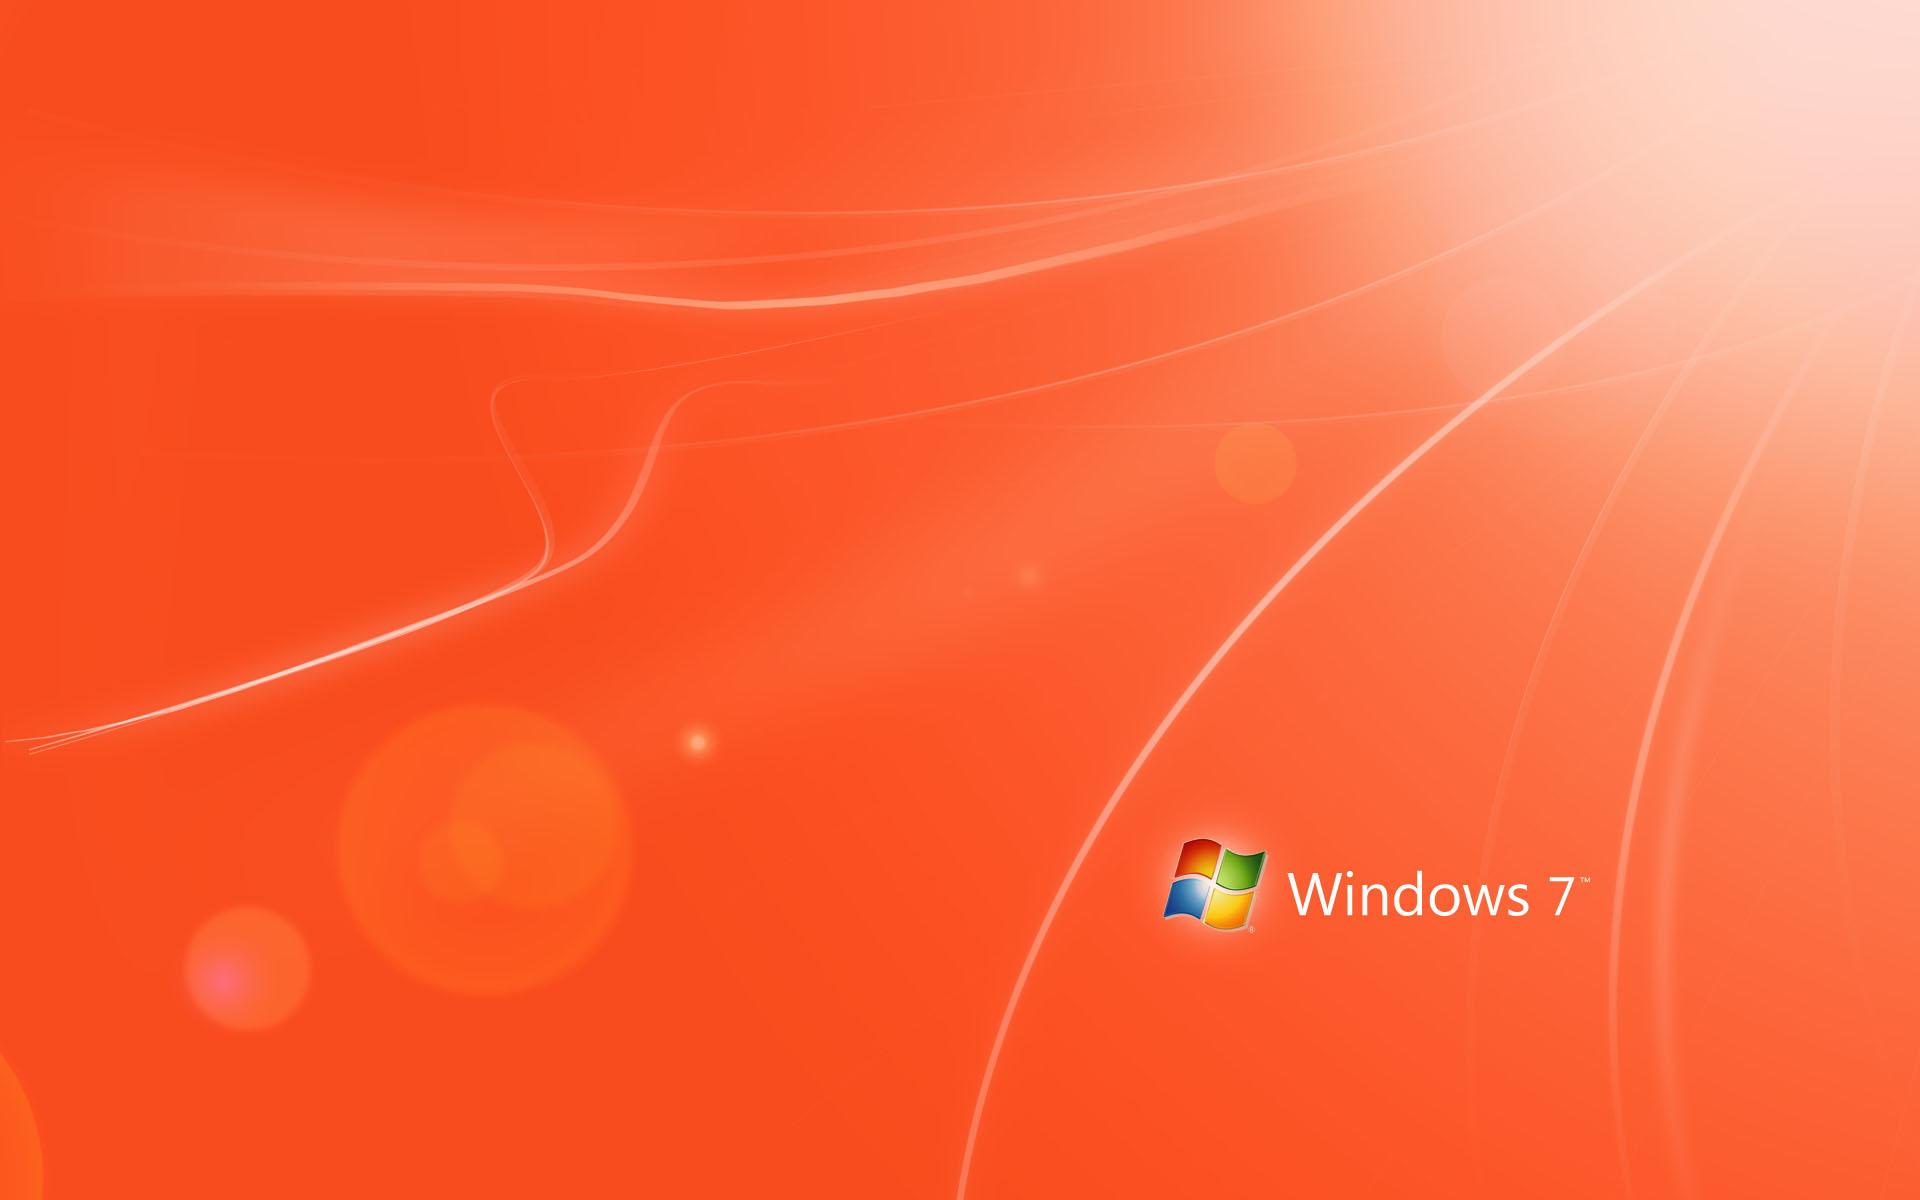 Orange Windows 7 Wallpapers HD Wallpapers 1920x1200